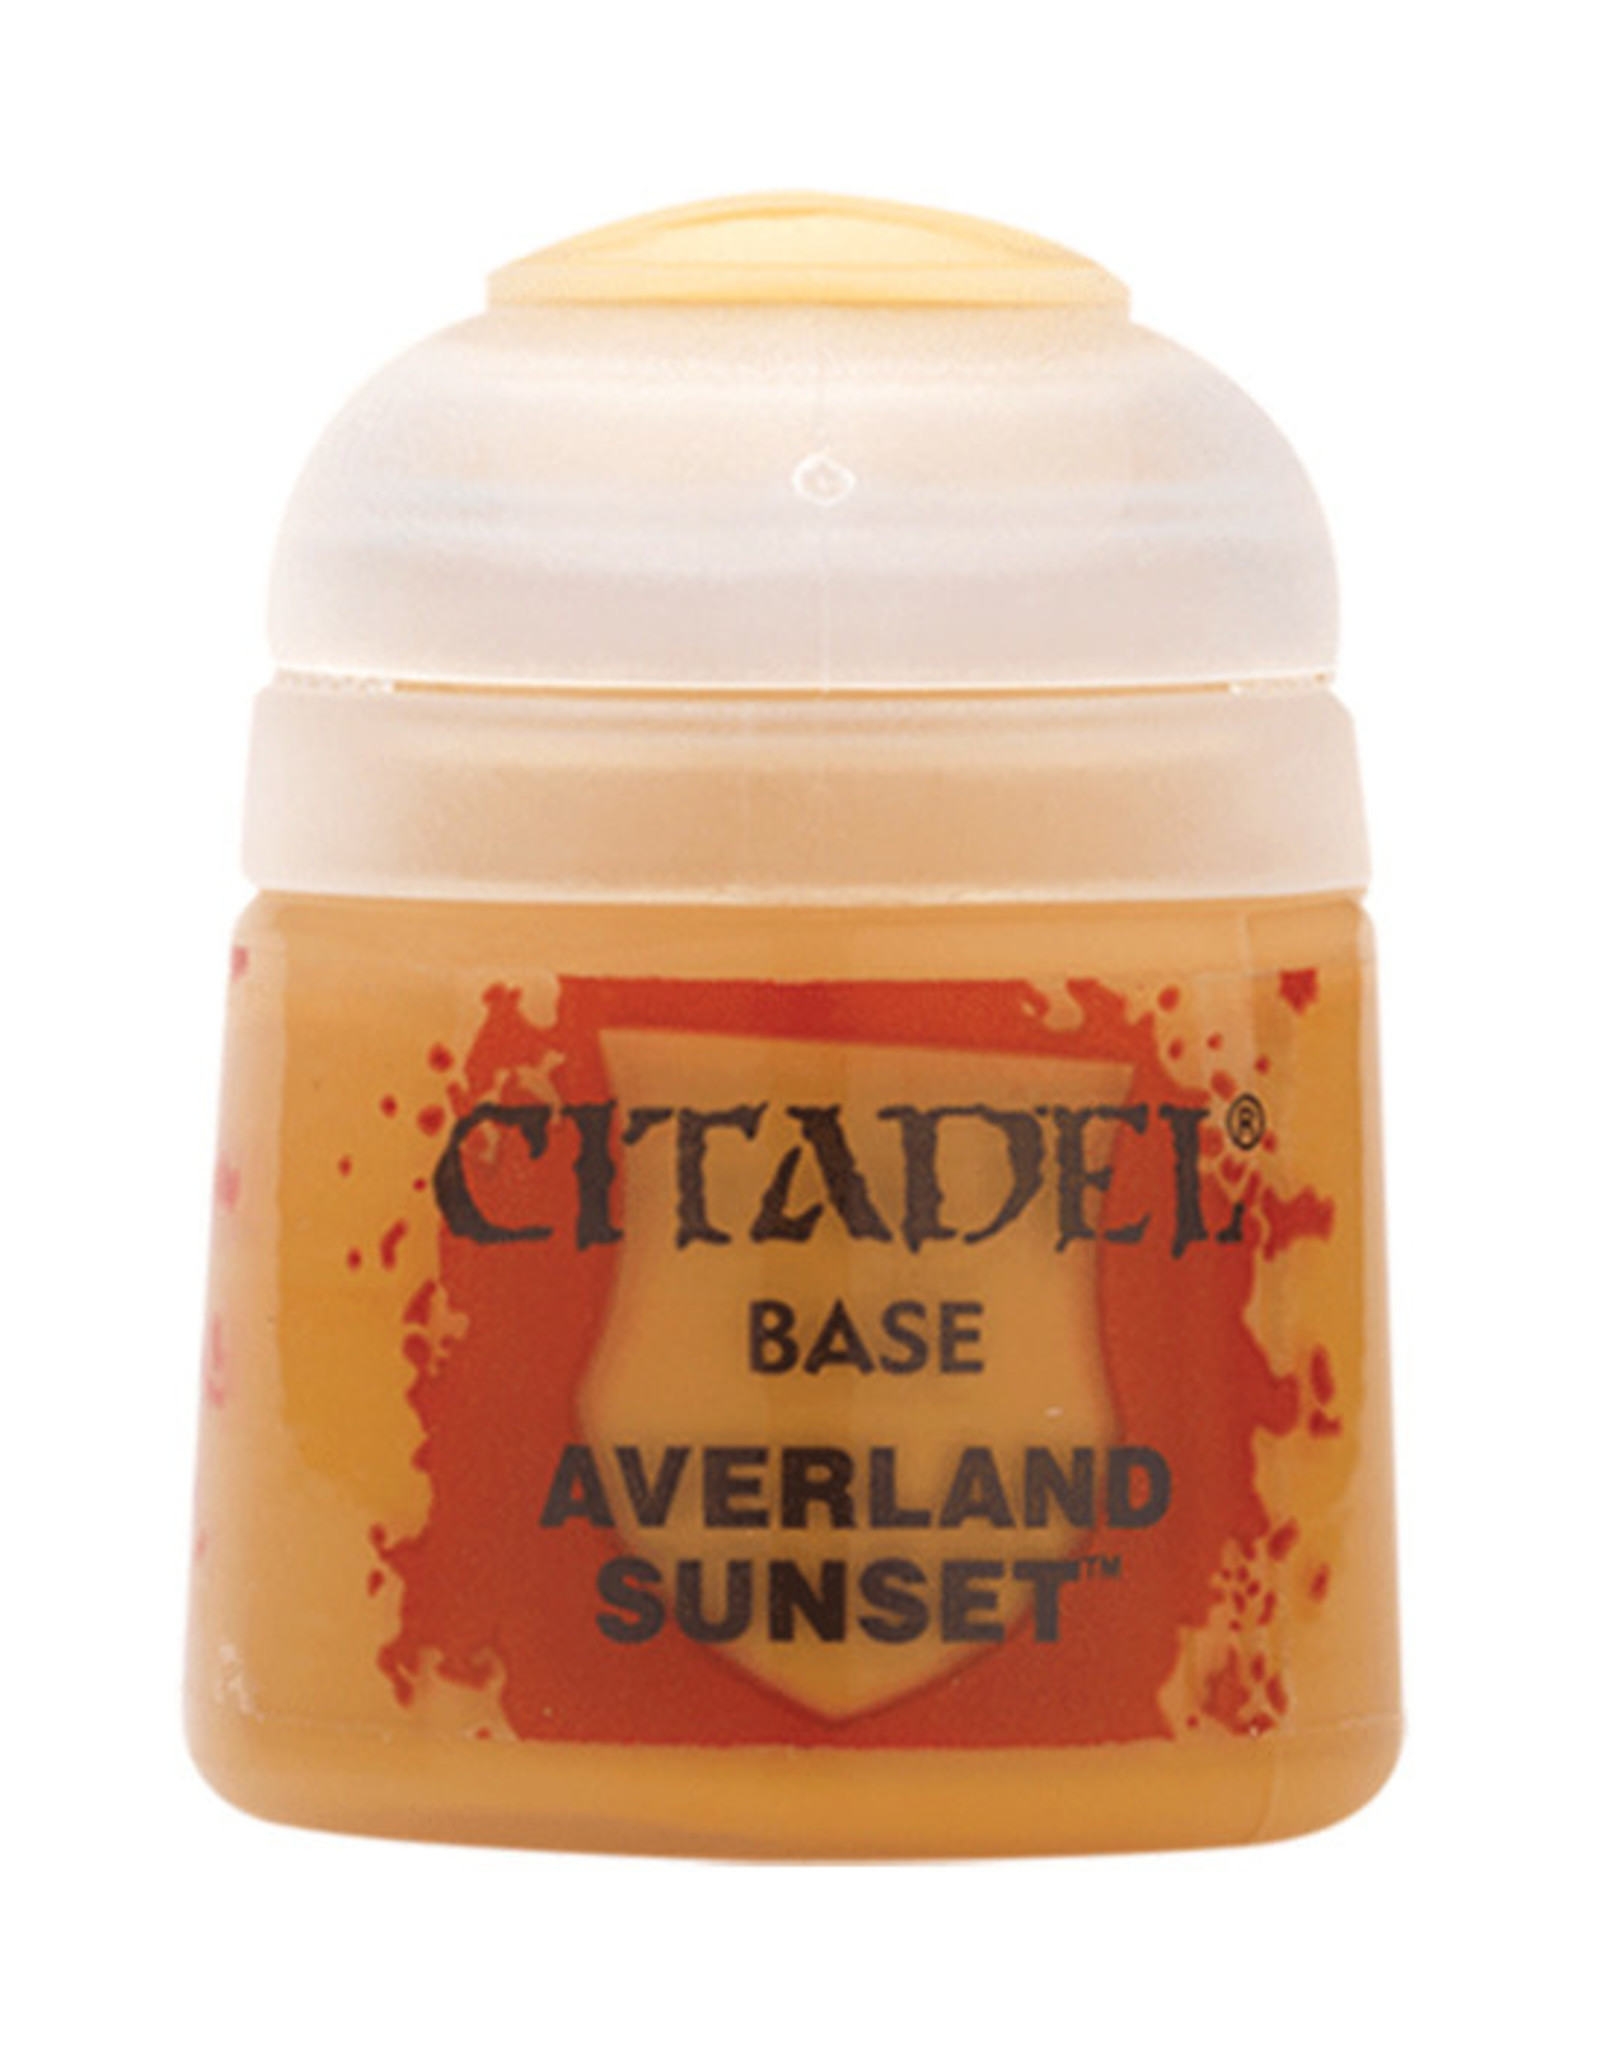 Citadel Citadel Colour: Base - Averland Sunset